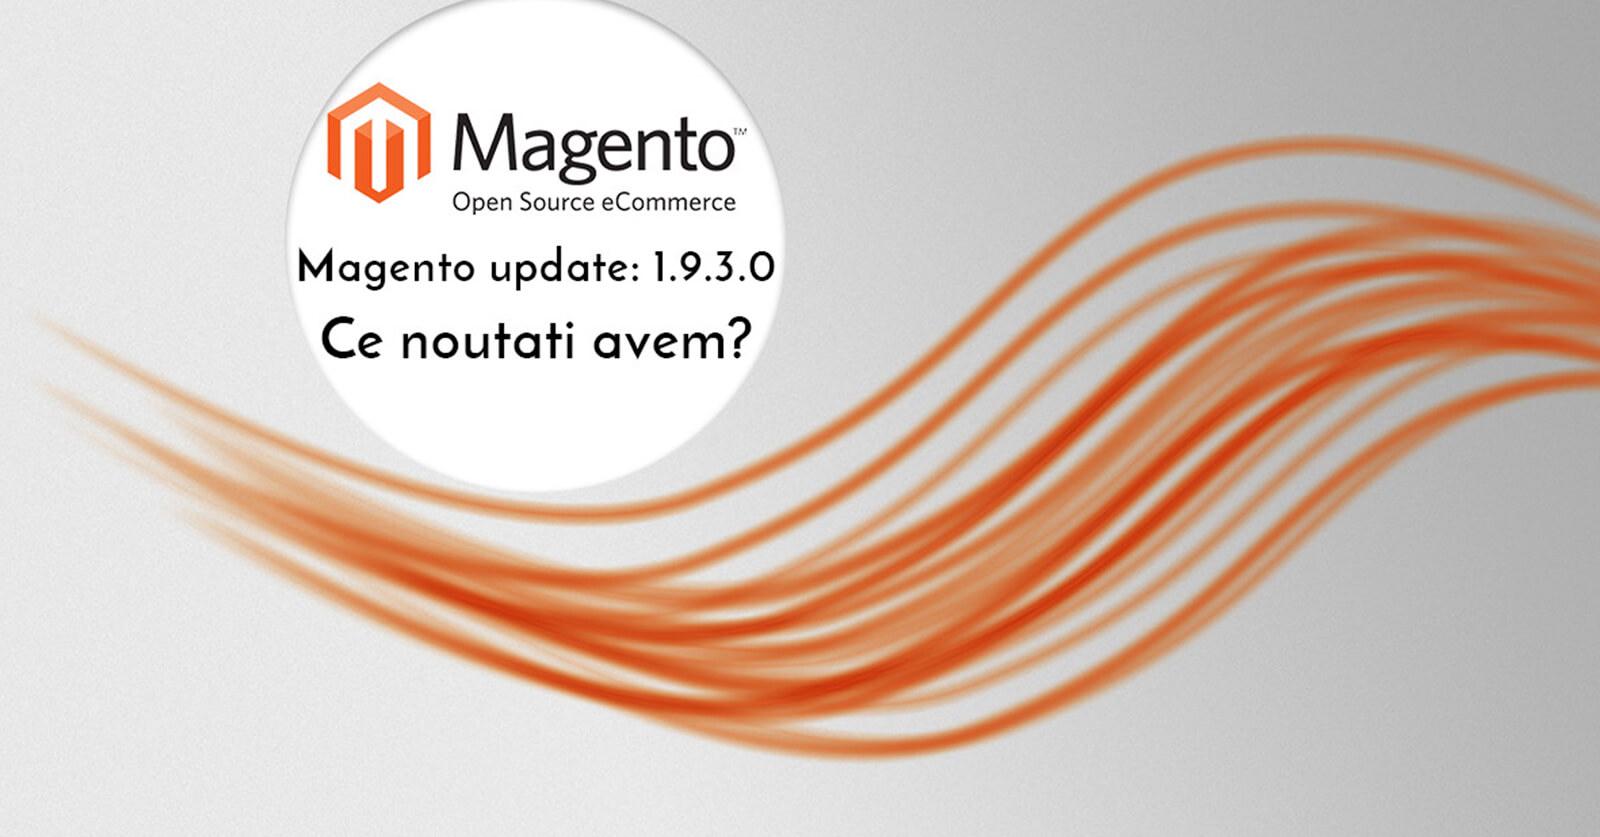 Magento CE update 1.9.3.0 – Ce noutati avem ?